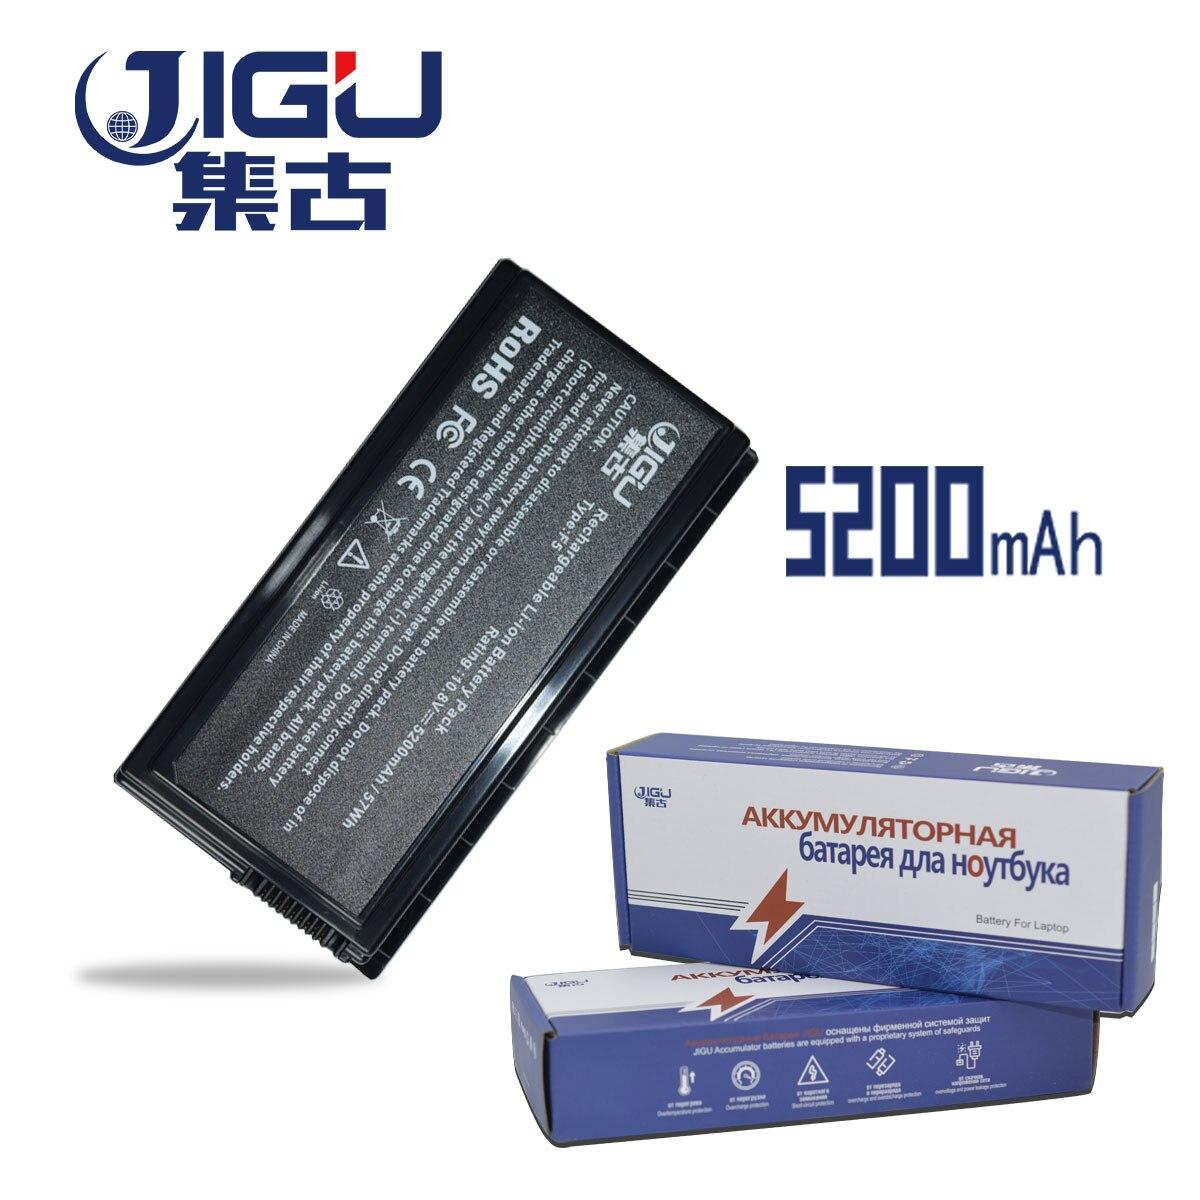 JIGU 6 celdas batería para Asus A32 f5 A32-f5 A32 F5c F5 F5C F5GL F5M F5N F5R F5RI F5SL F5Sr F5V F5VI F5Z X50 X50C X50M X50N X50R